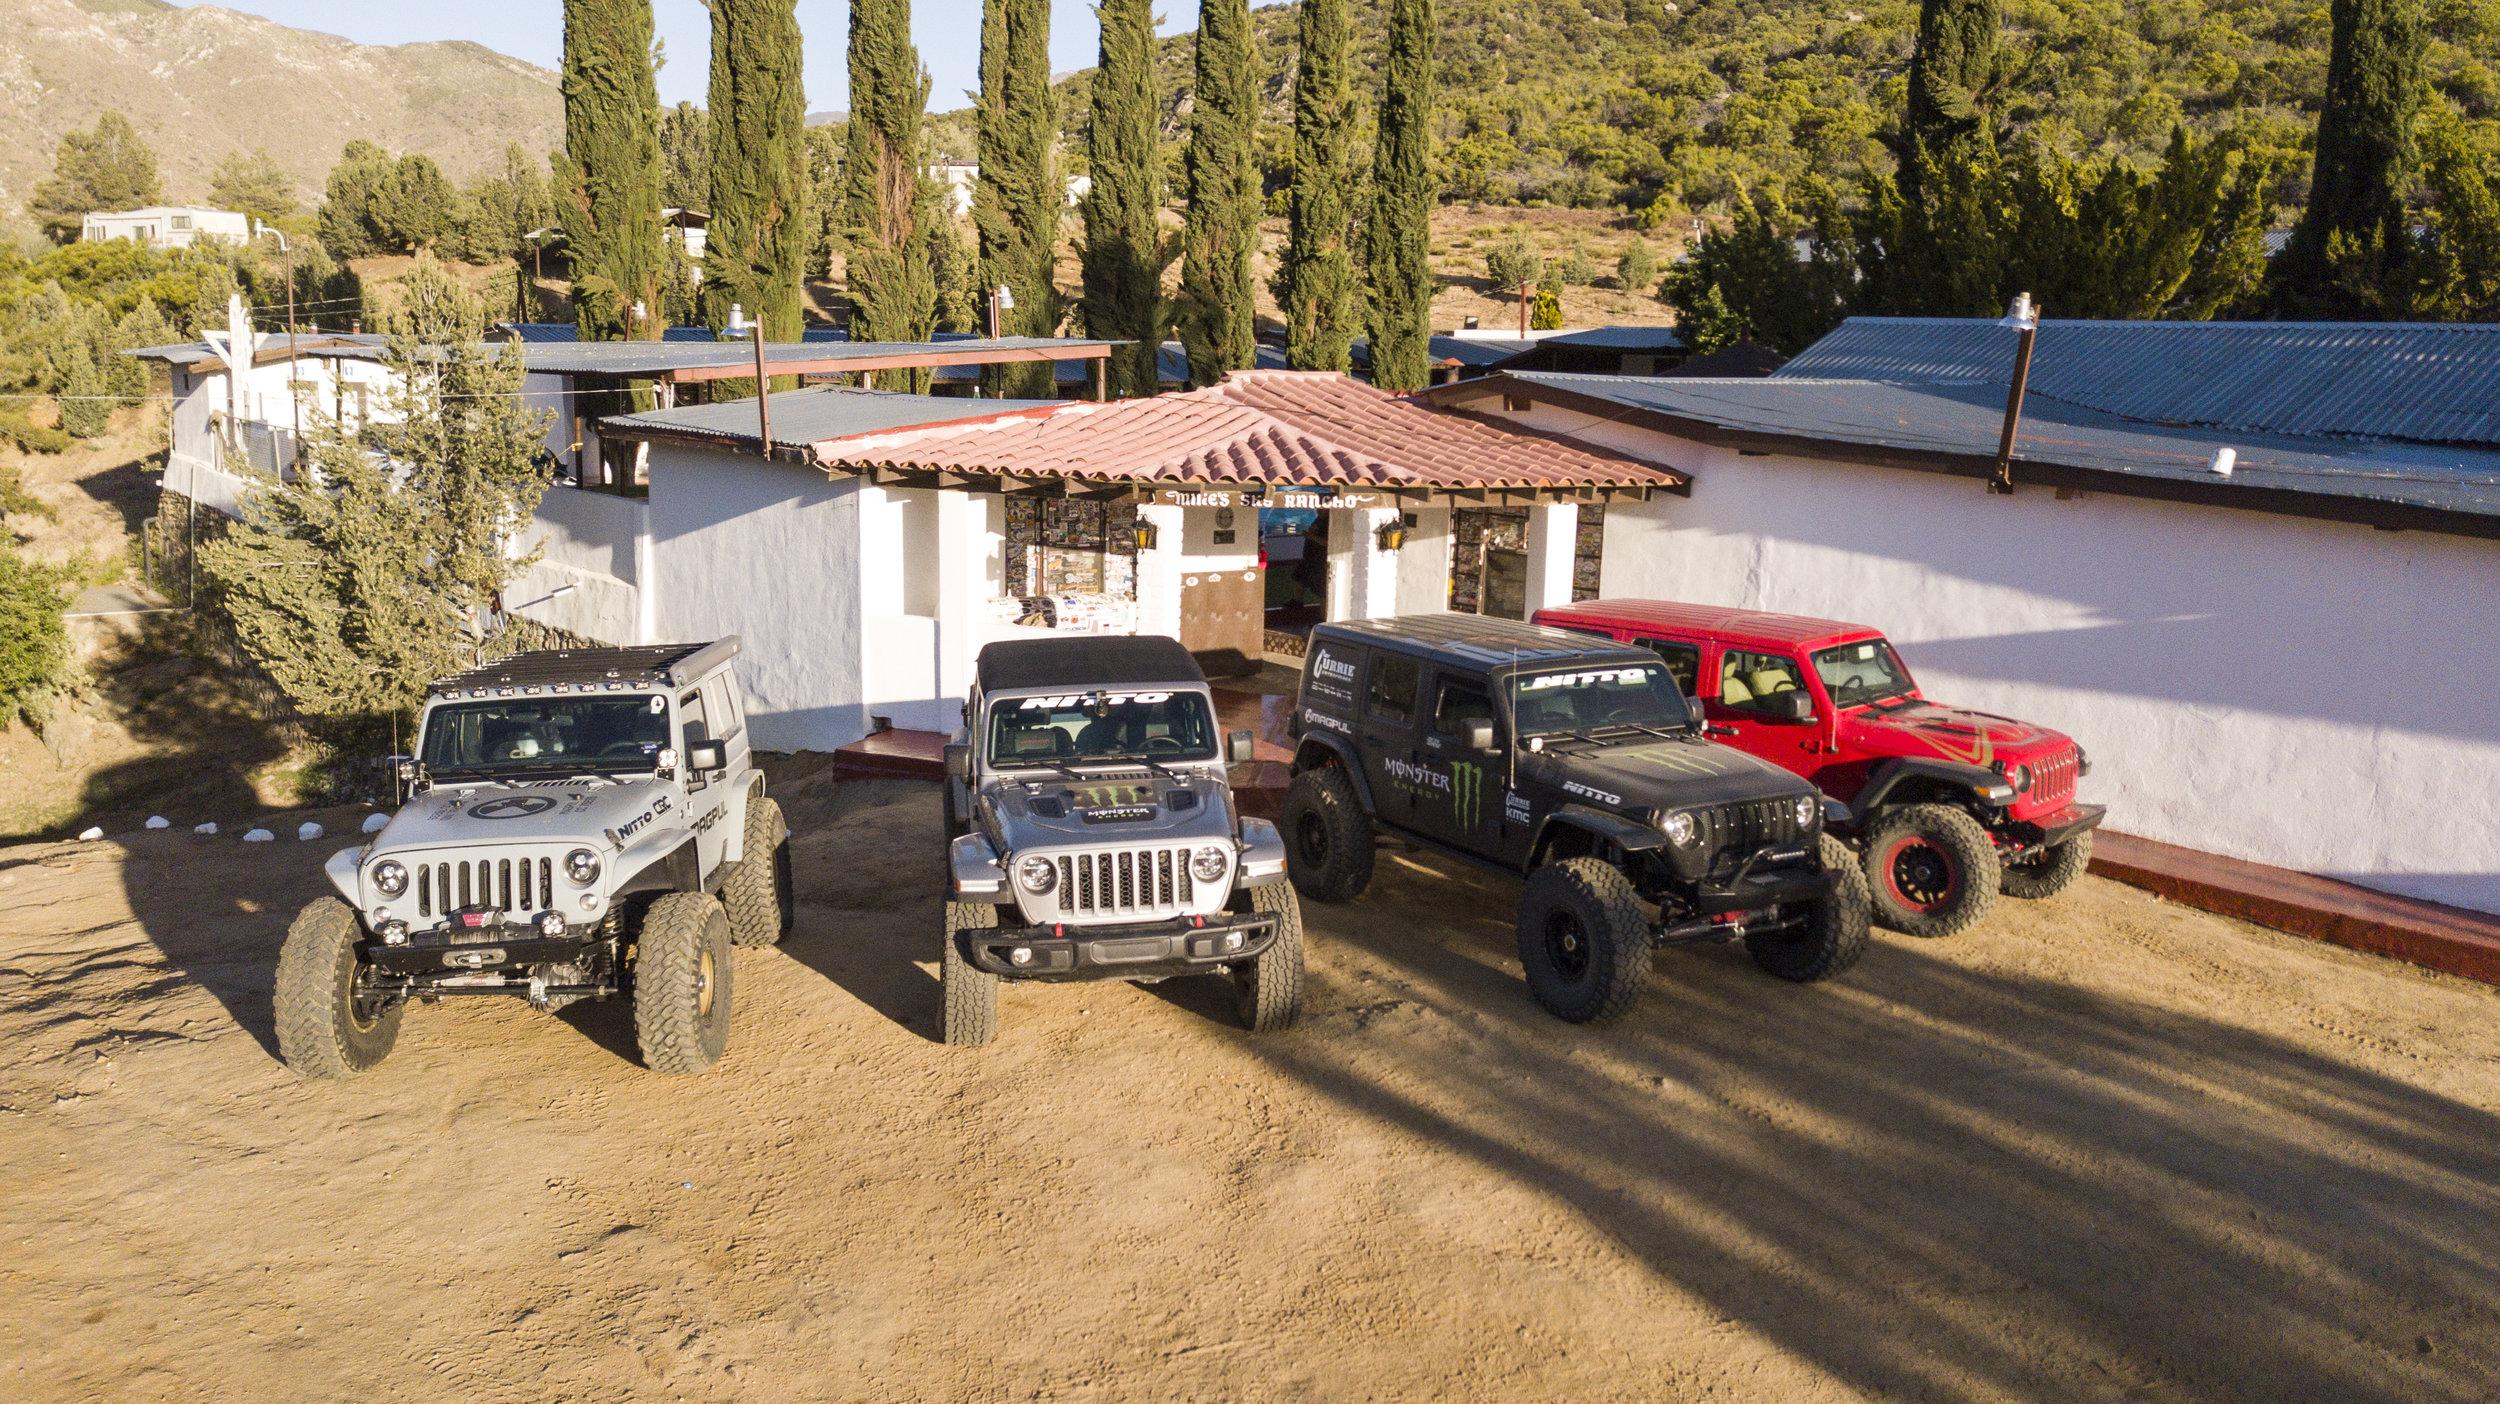 6_24_CaseyCurrie_Baja500PreRunning_BajaMexico_Jeep_007.jpg